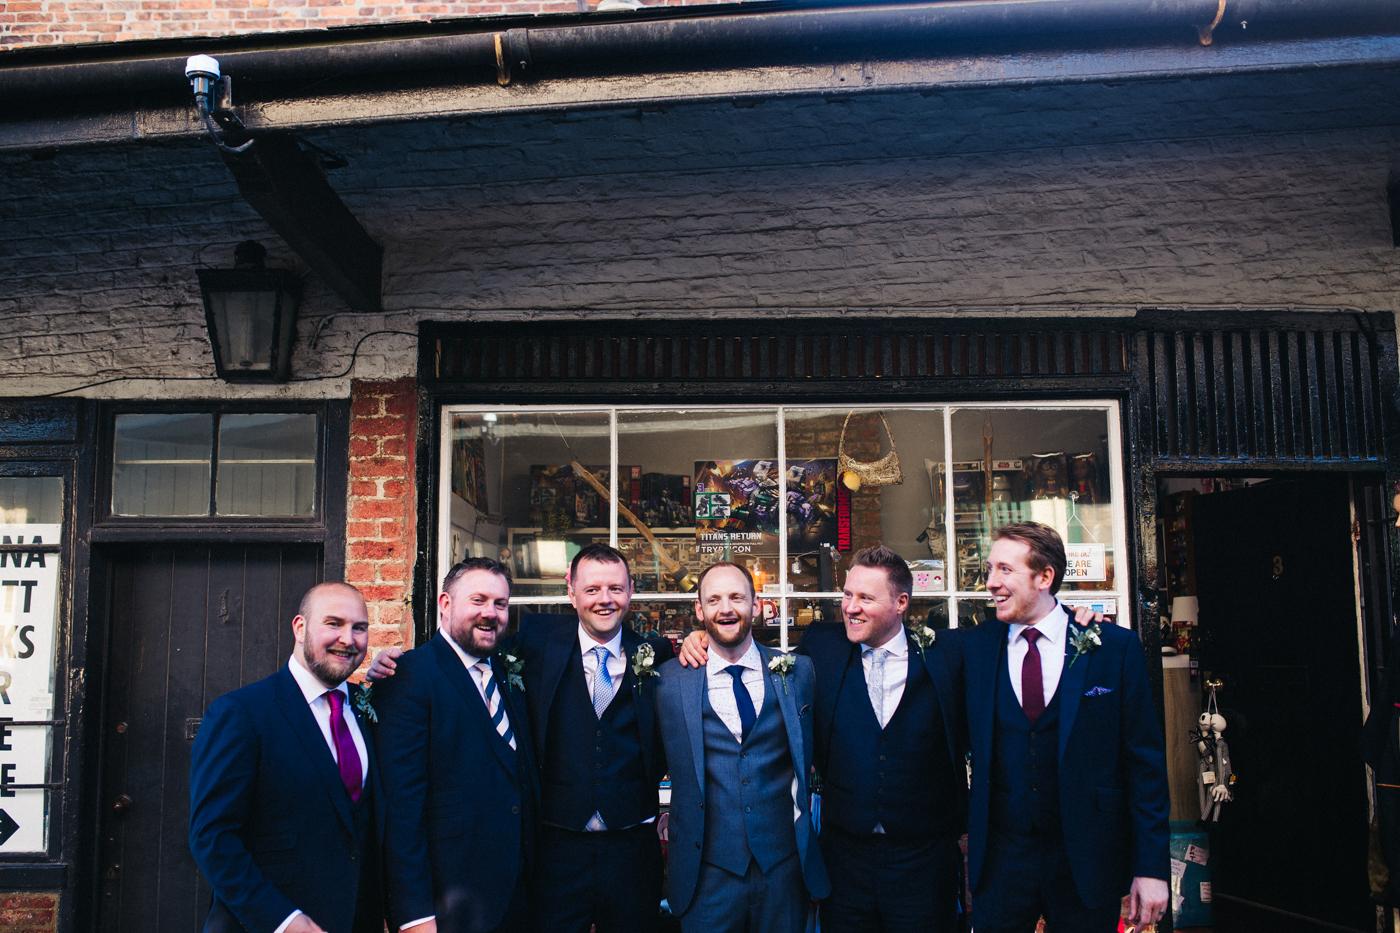 york-house-malton-wedding-photographer-north-yorkshire-0024.jpg